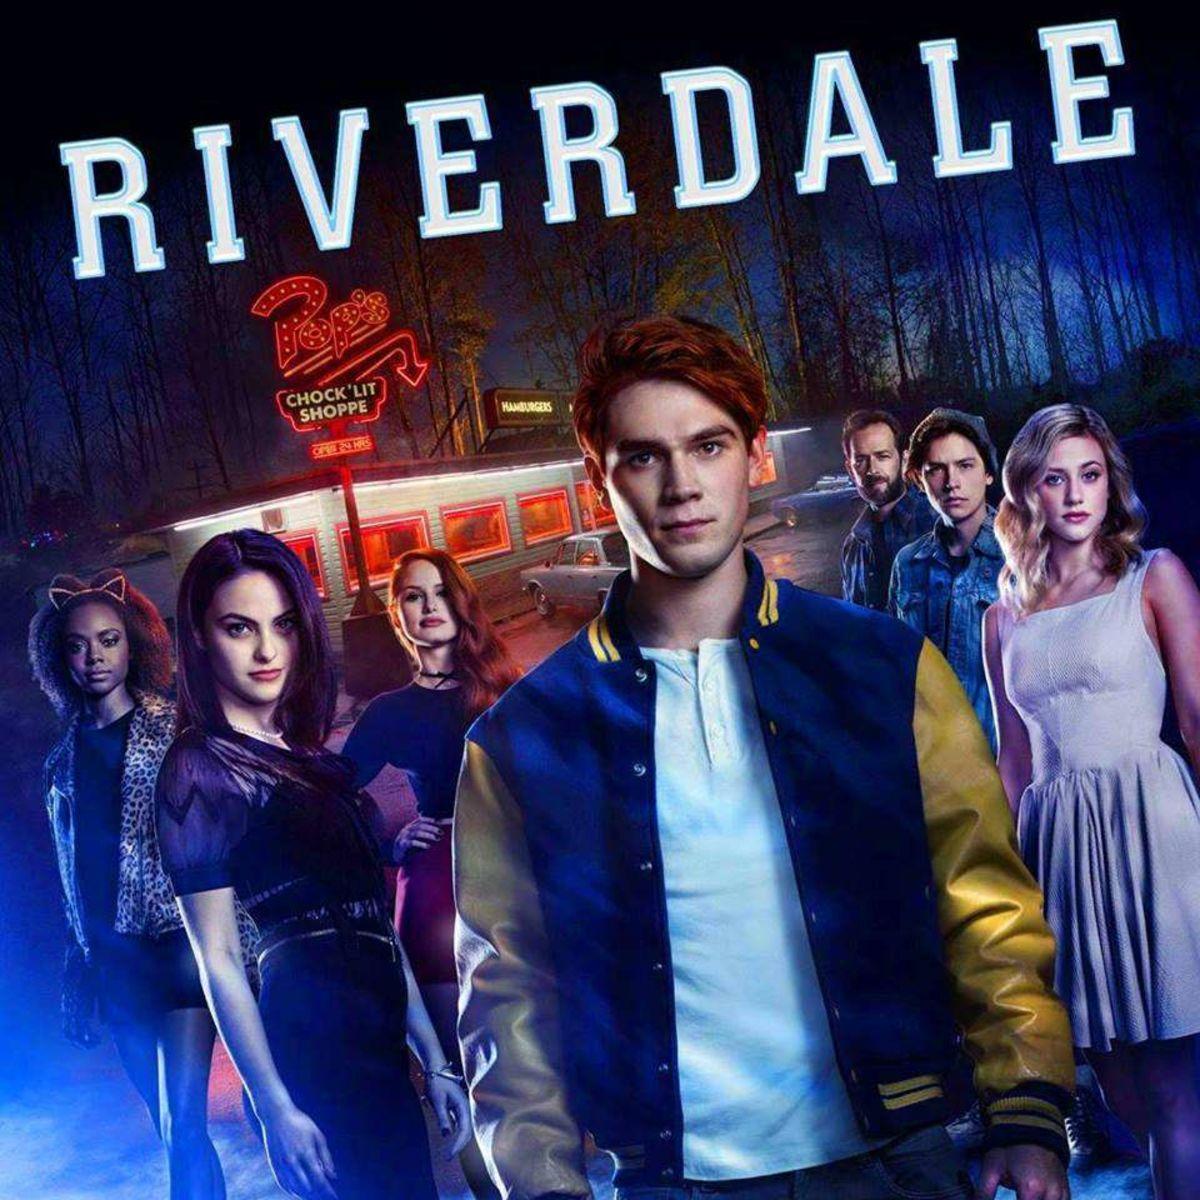 Riverdale-promo-image.jpg